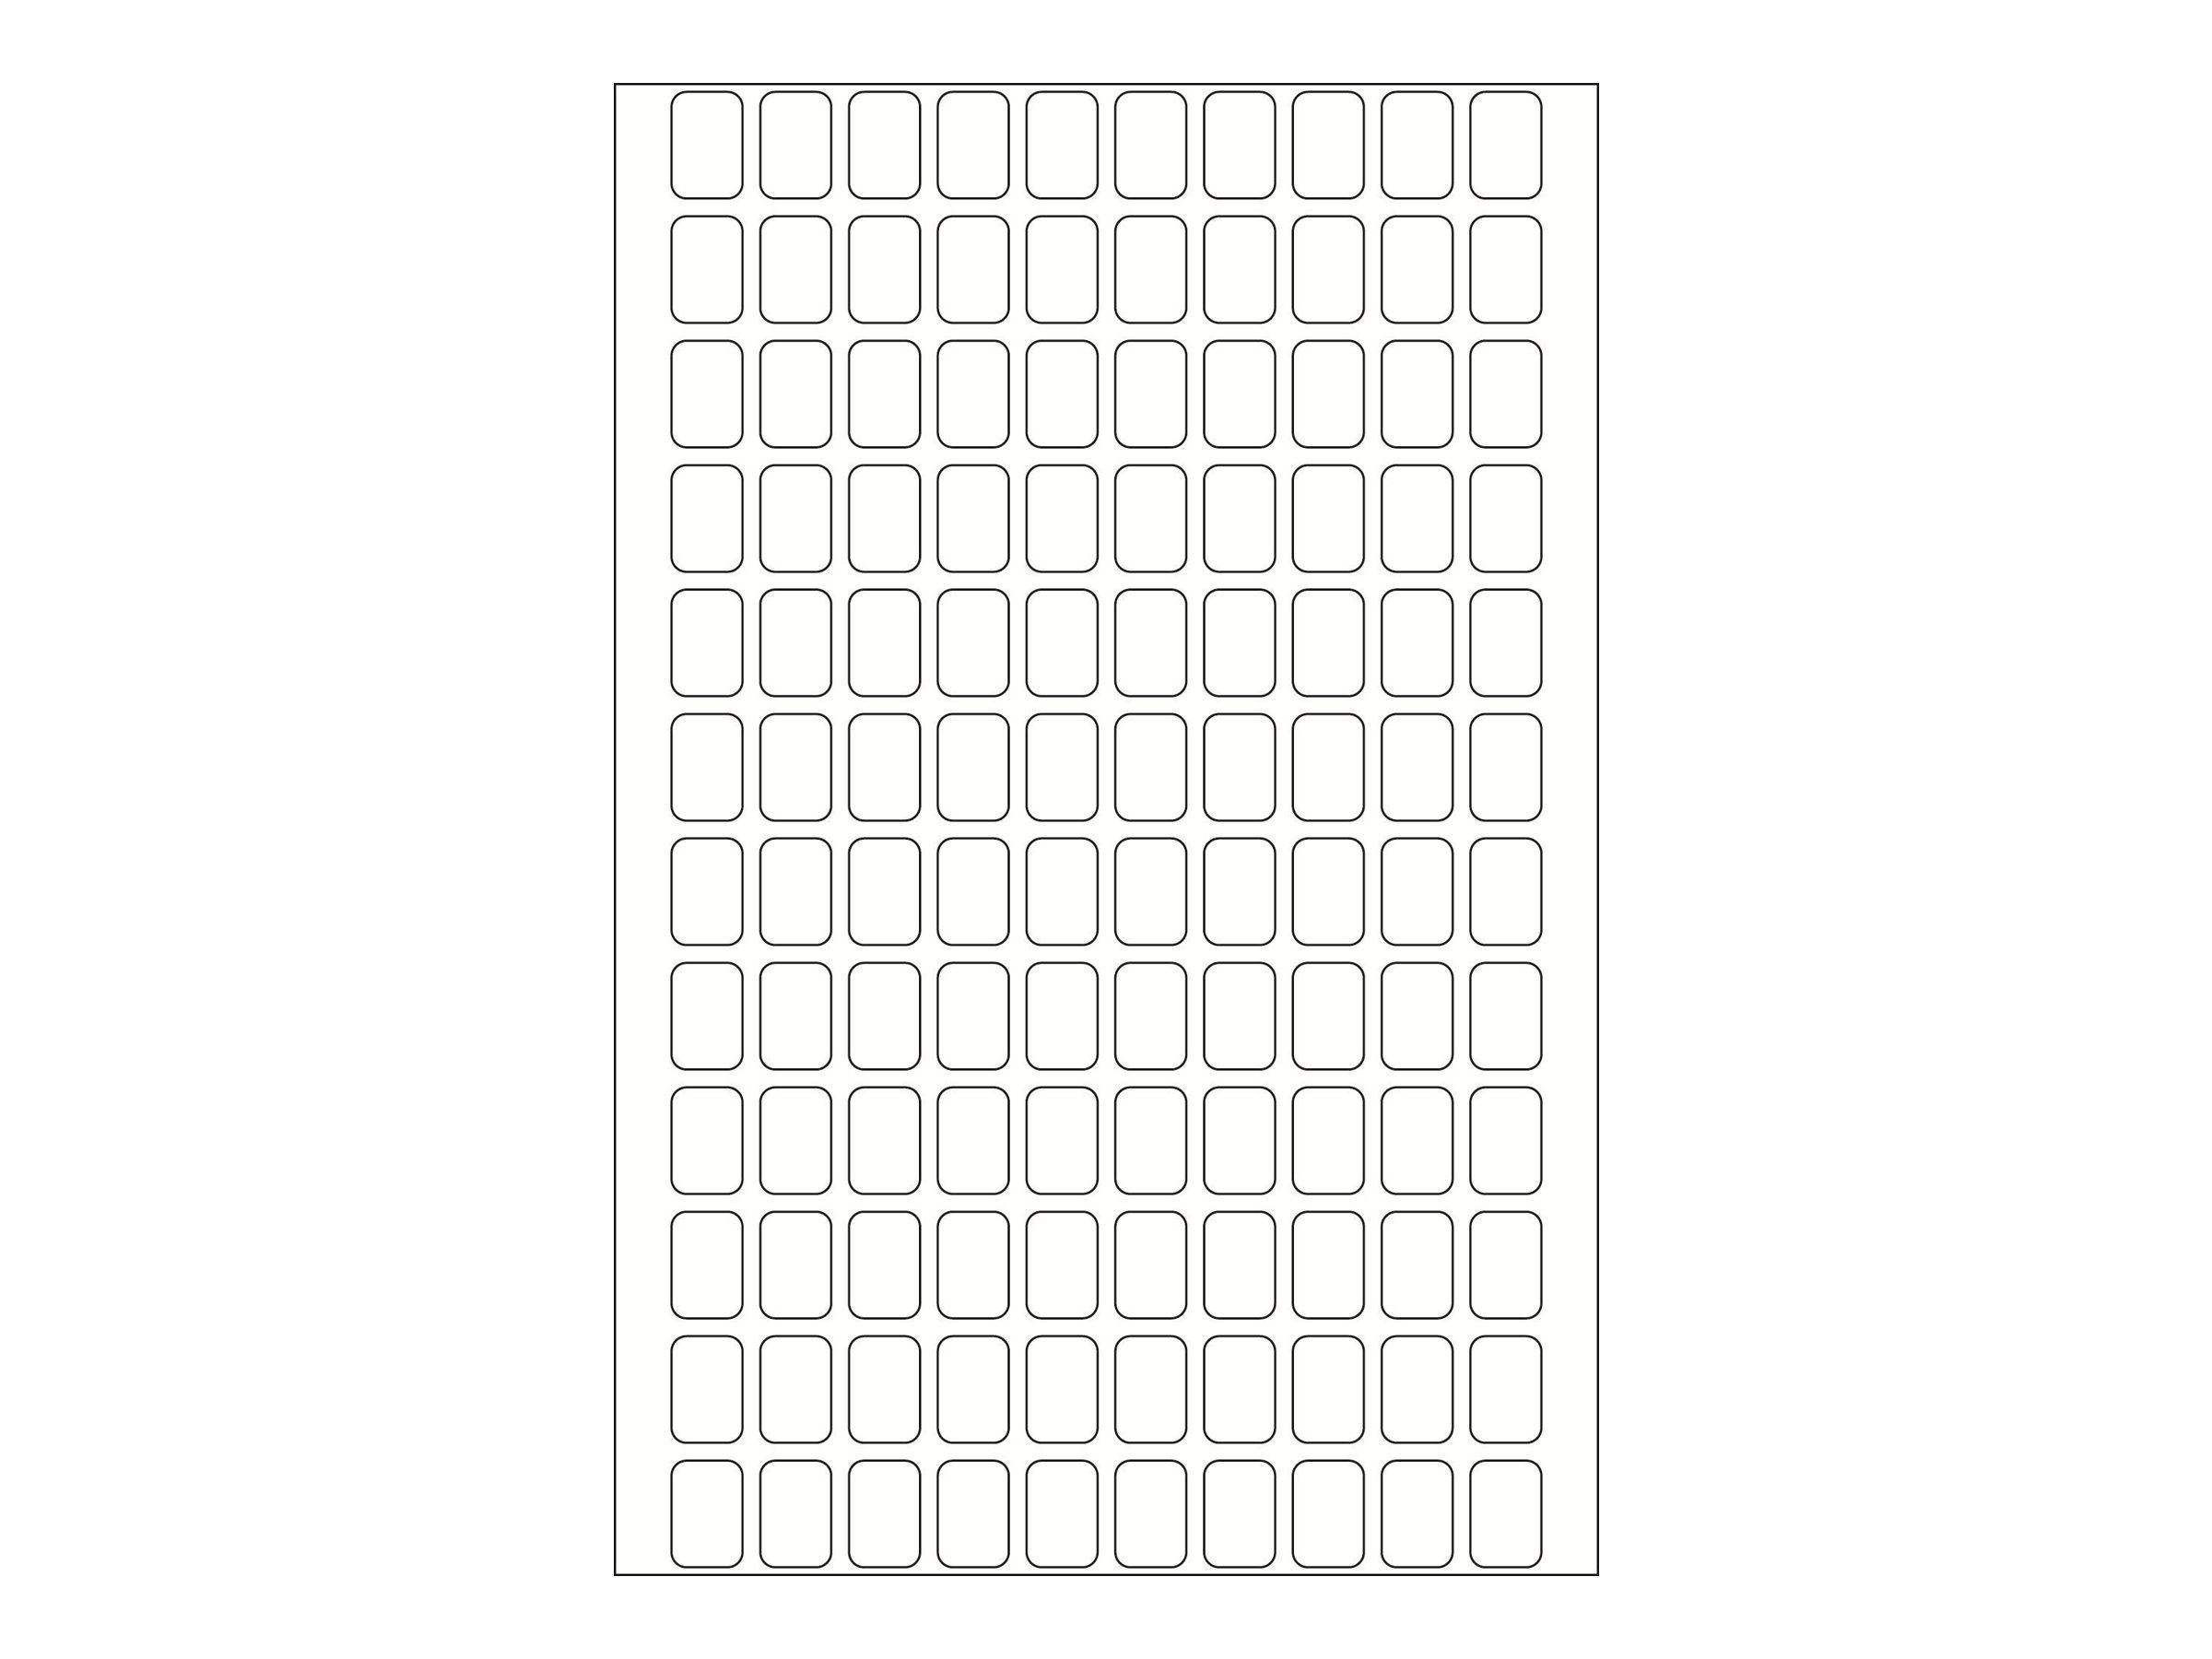 HERMA Papier - selbstklebend - weiß - 8 x 12 mm 3840 Etikett(en) (32 Bogen x 120)